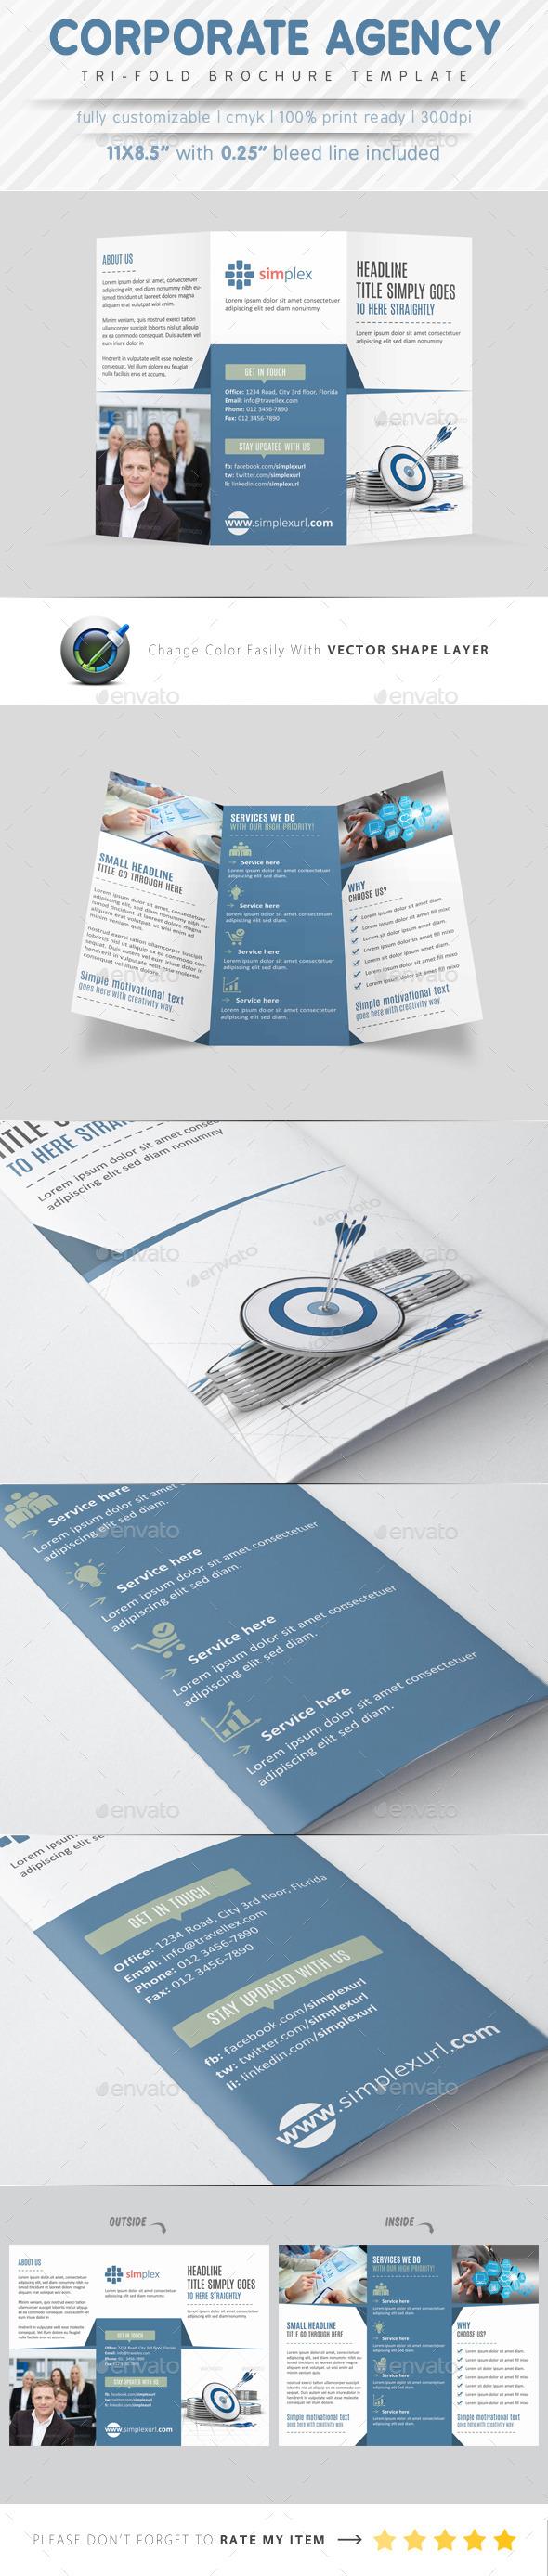 GraphicRiver Corporate Agency Tri Fold Brochure 9280076